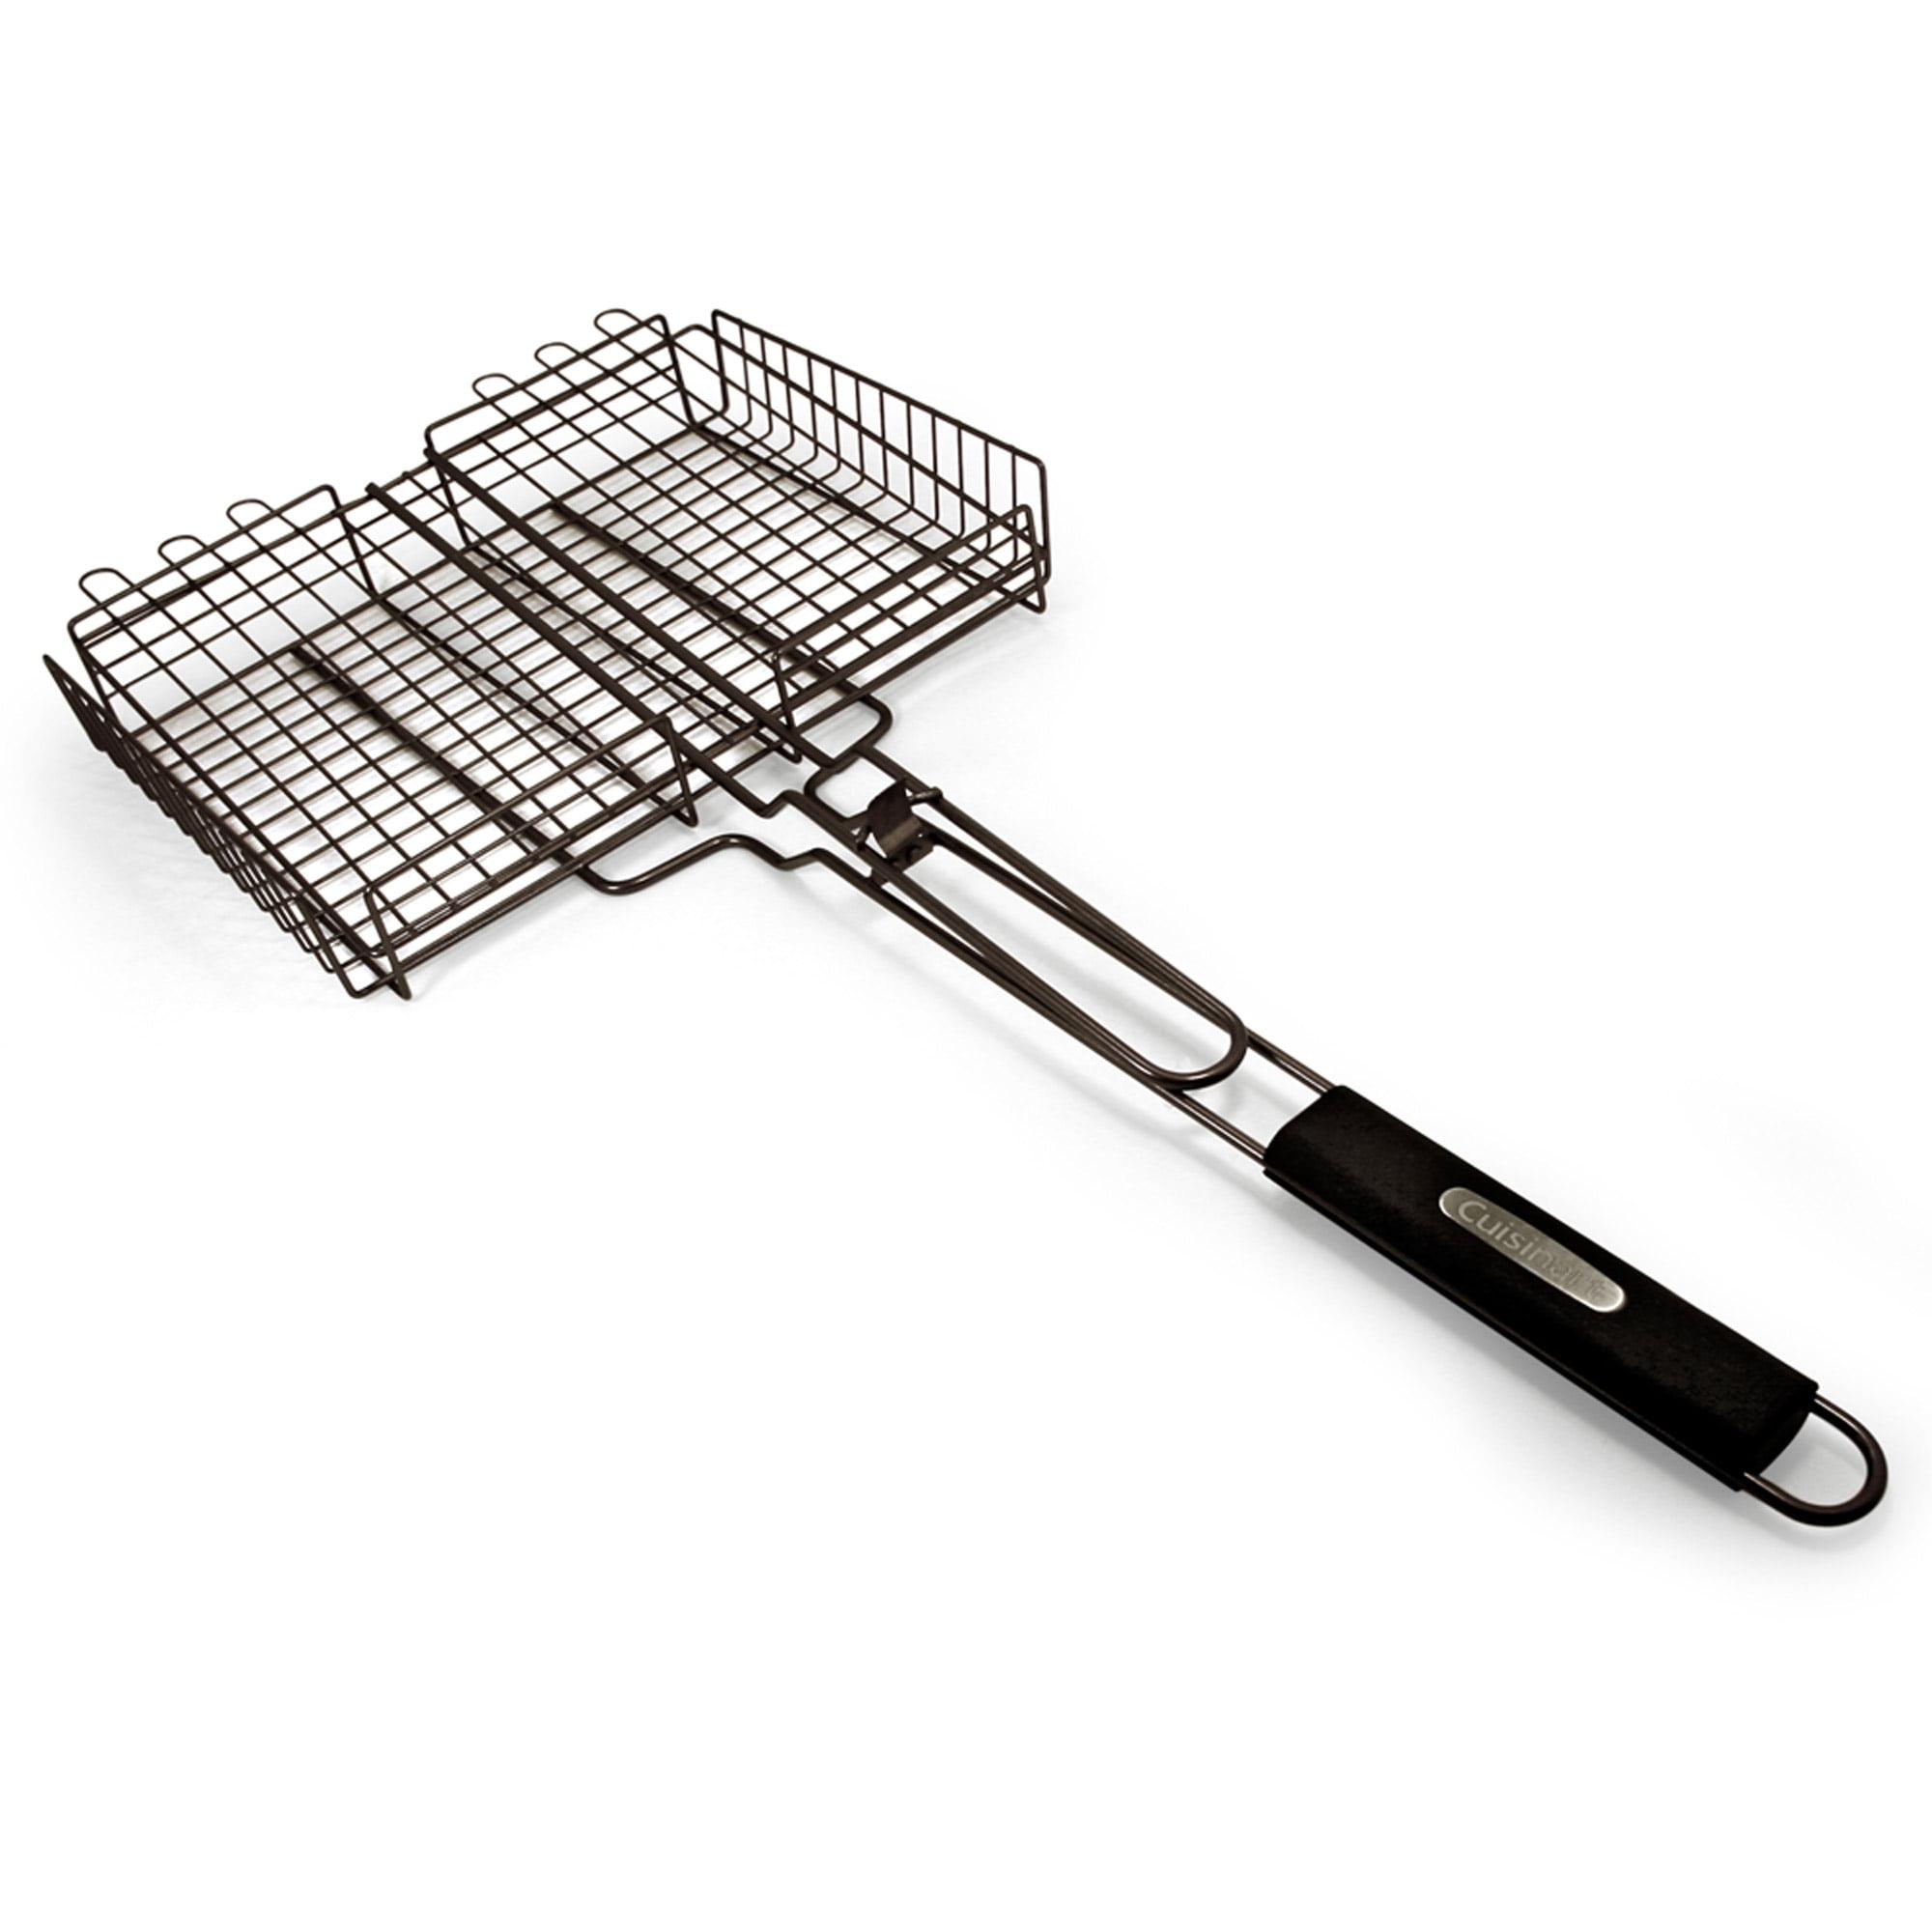 Cuisinart Grilling Basket, CNTB-422